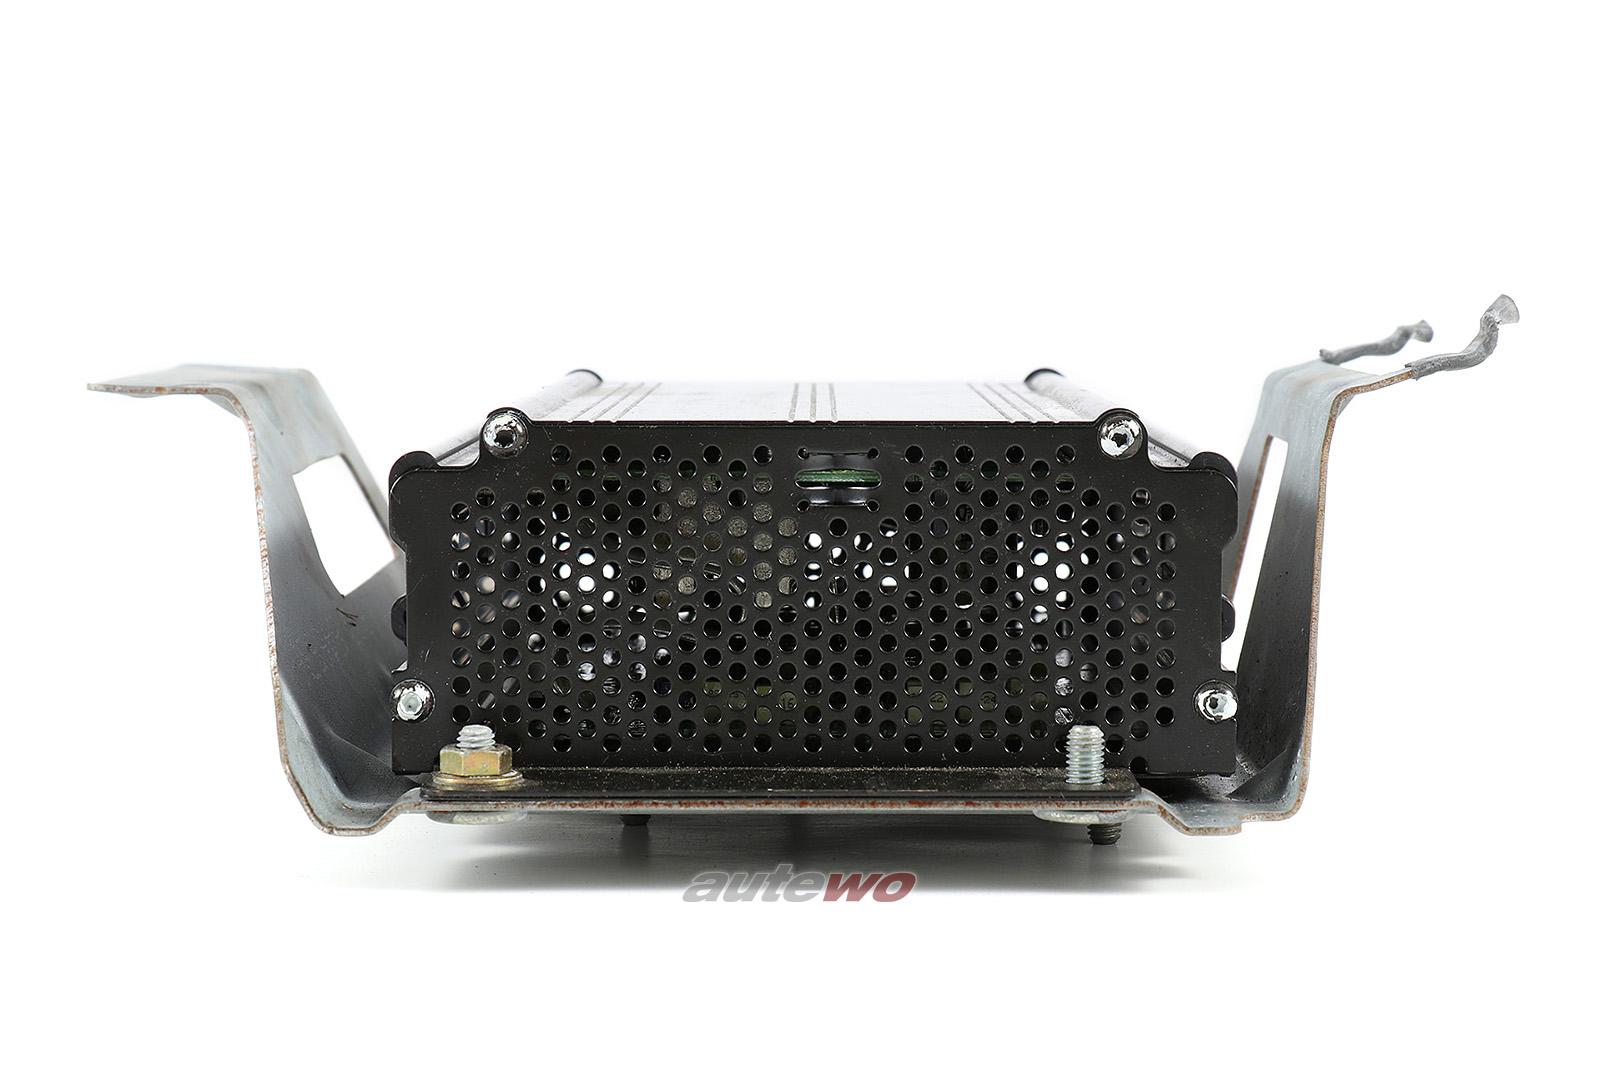 8N7035223 Audi TT 8N Roadster Verstärker für Fahrzeuge mit BOSE-Soundsystem